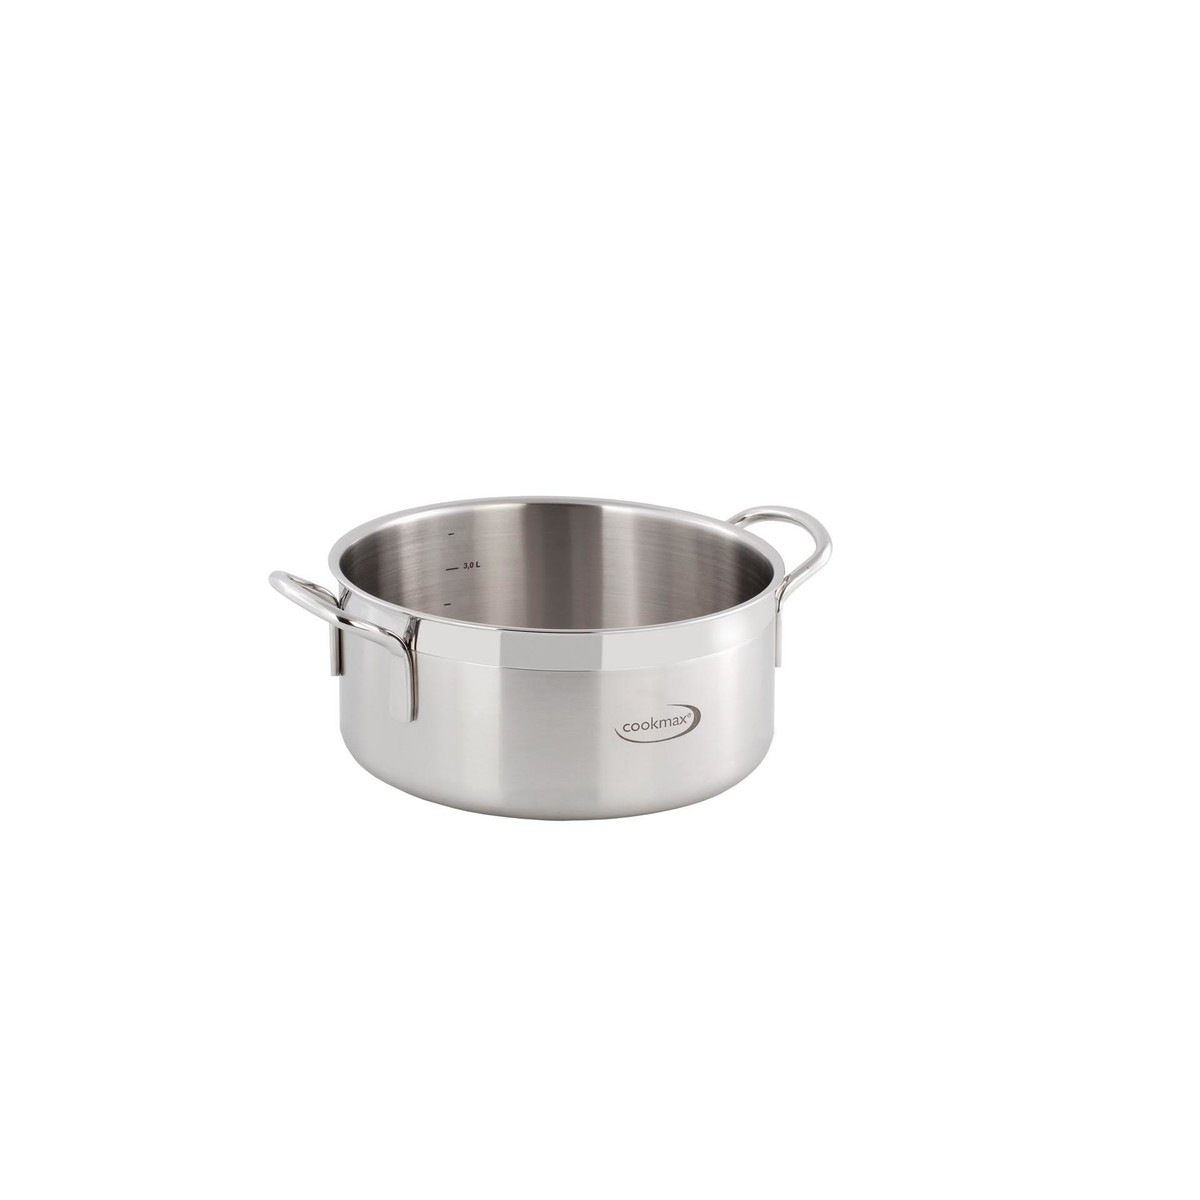 "Bratentopf flach ""Cookmax Gourmet"" Ø 24 cm, H: 10,5 cm. Inhalt 4,7L"